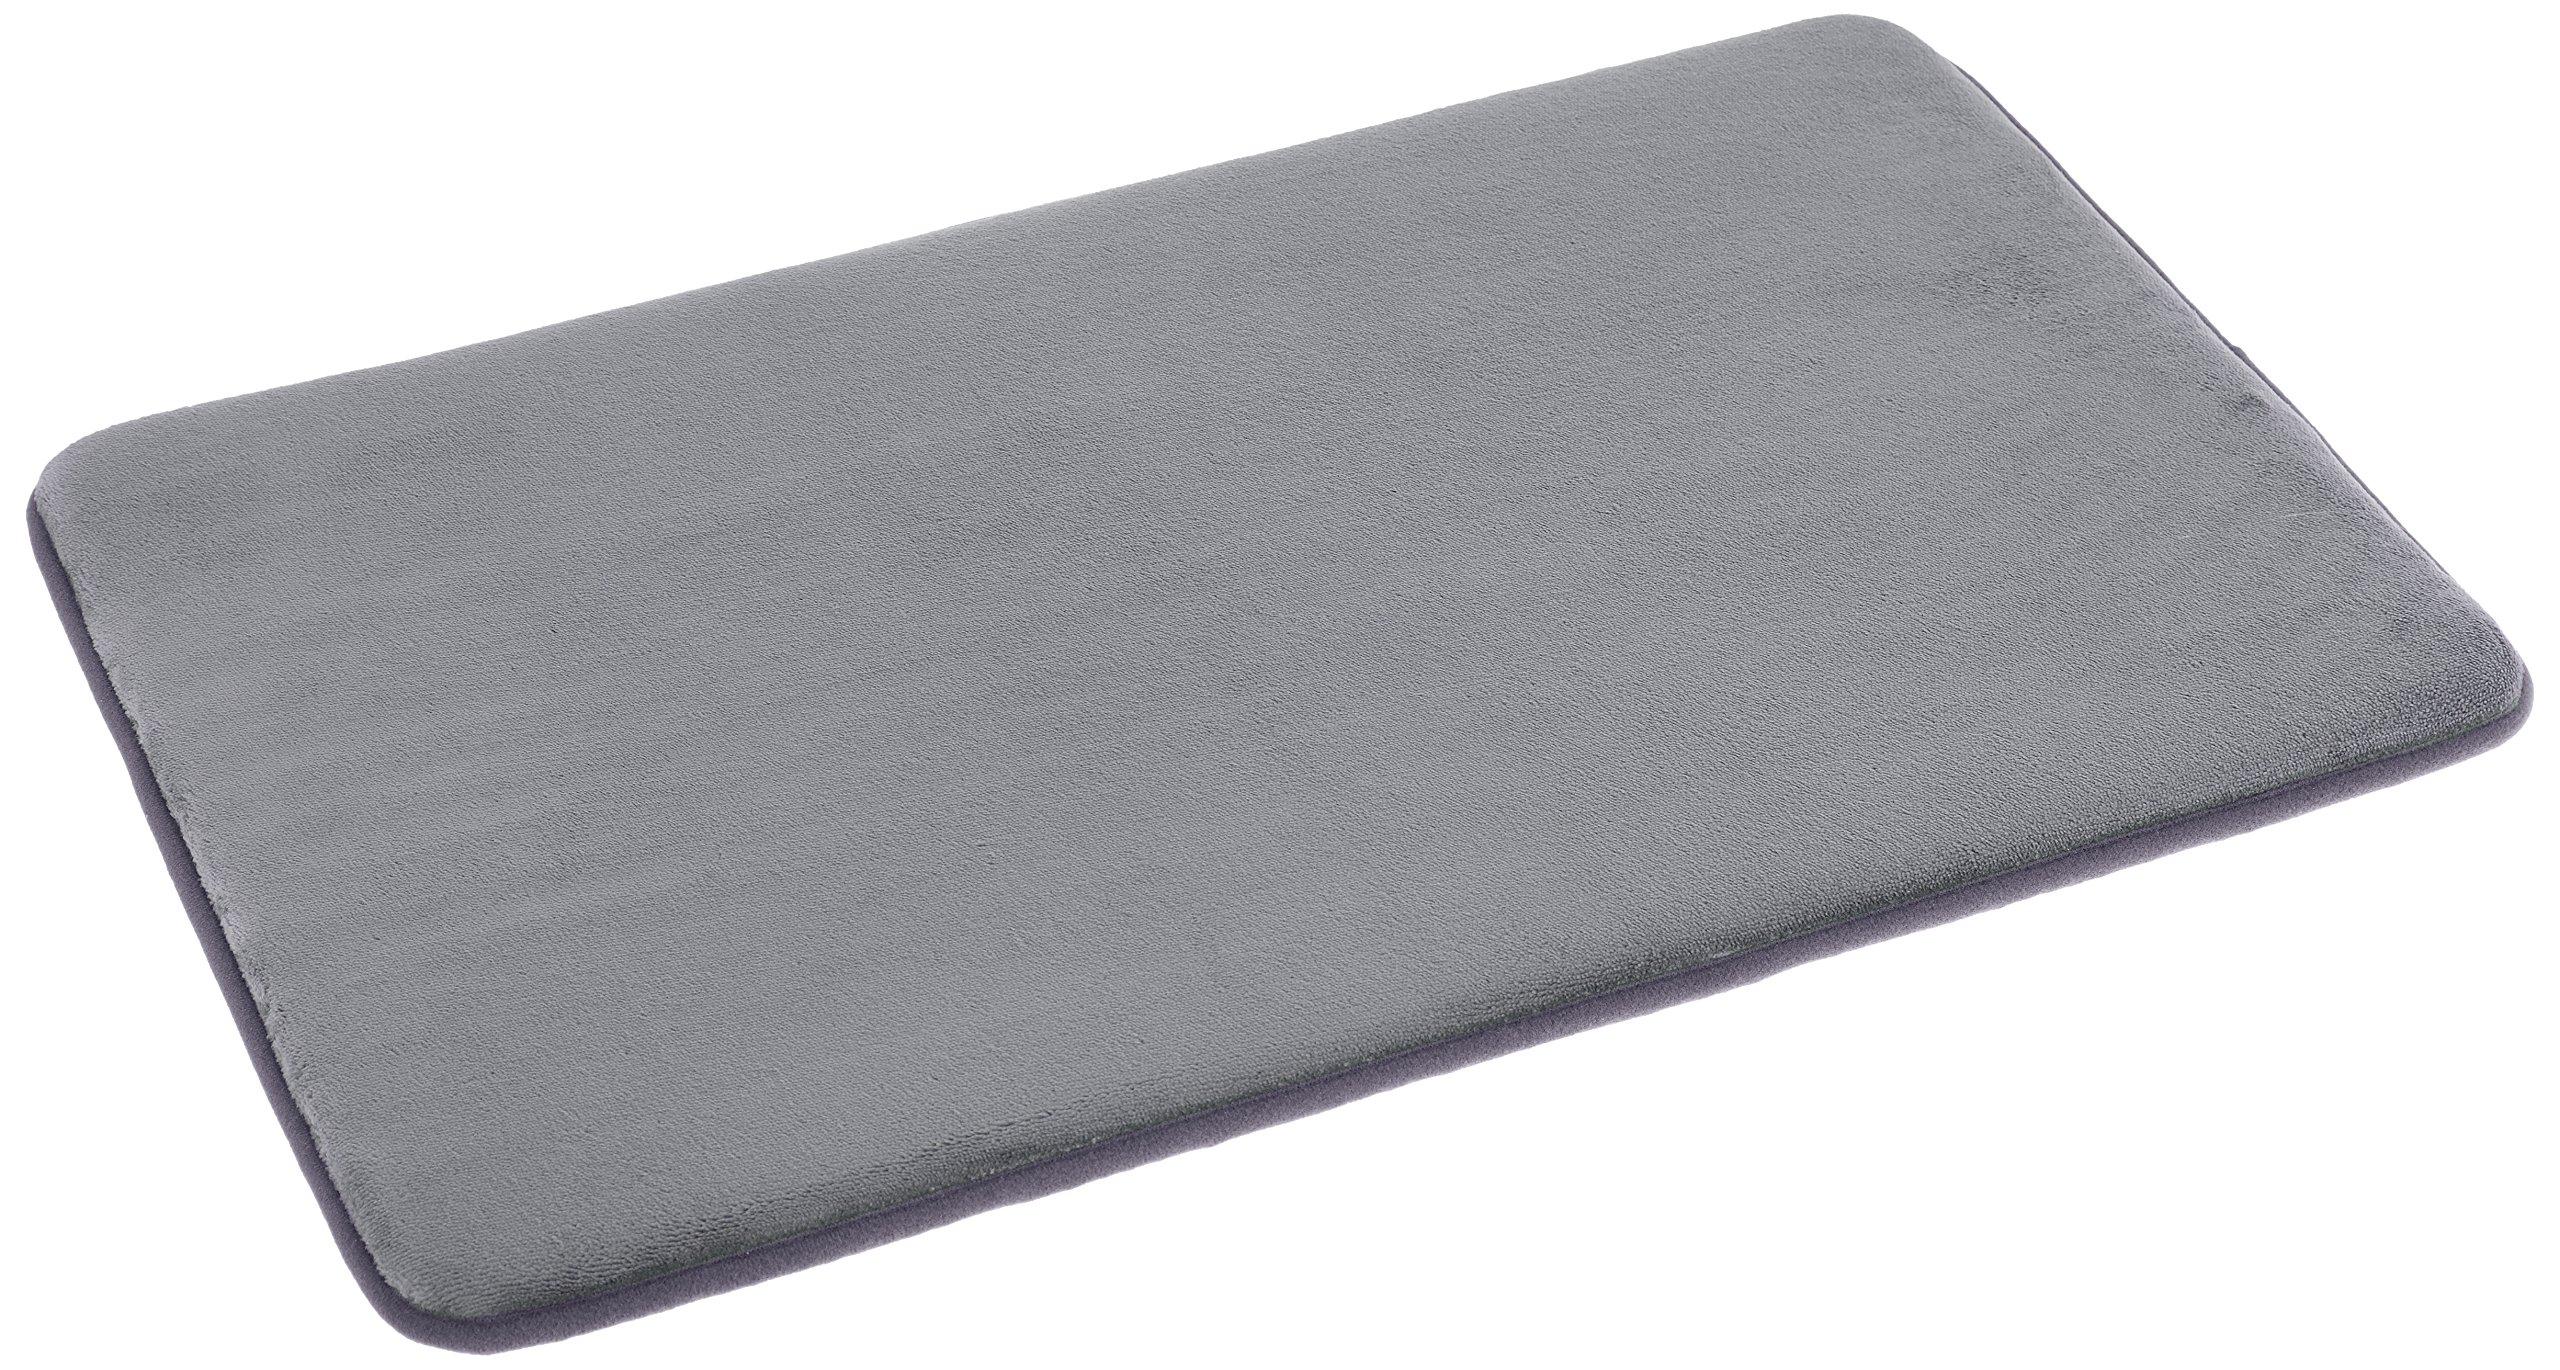 AmazonBasics Non-Slip Memory Foam Bathmat 18'' x 28'', Gray by AmazonBasics